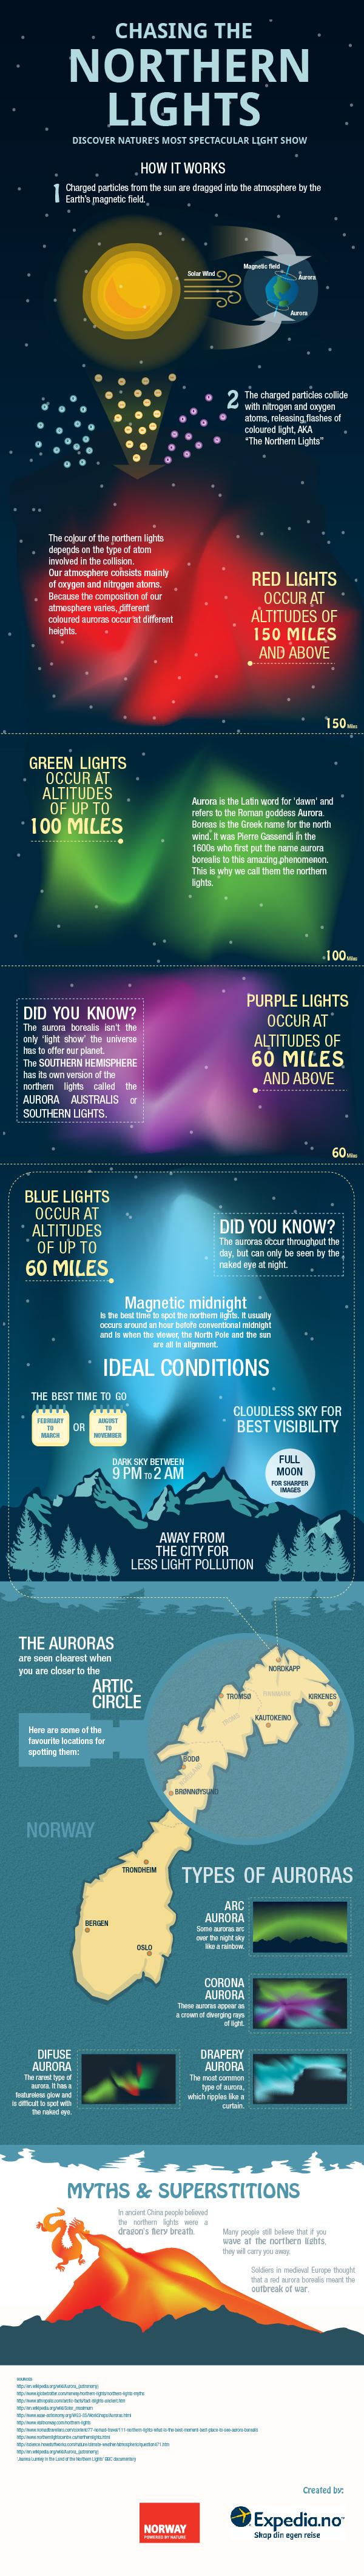 northern-lights-infographic-en-2